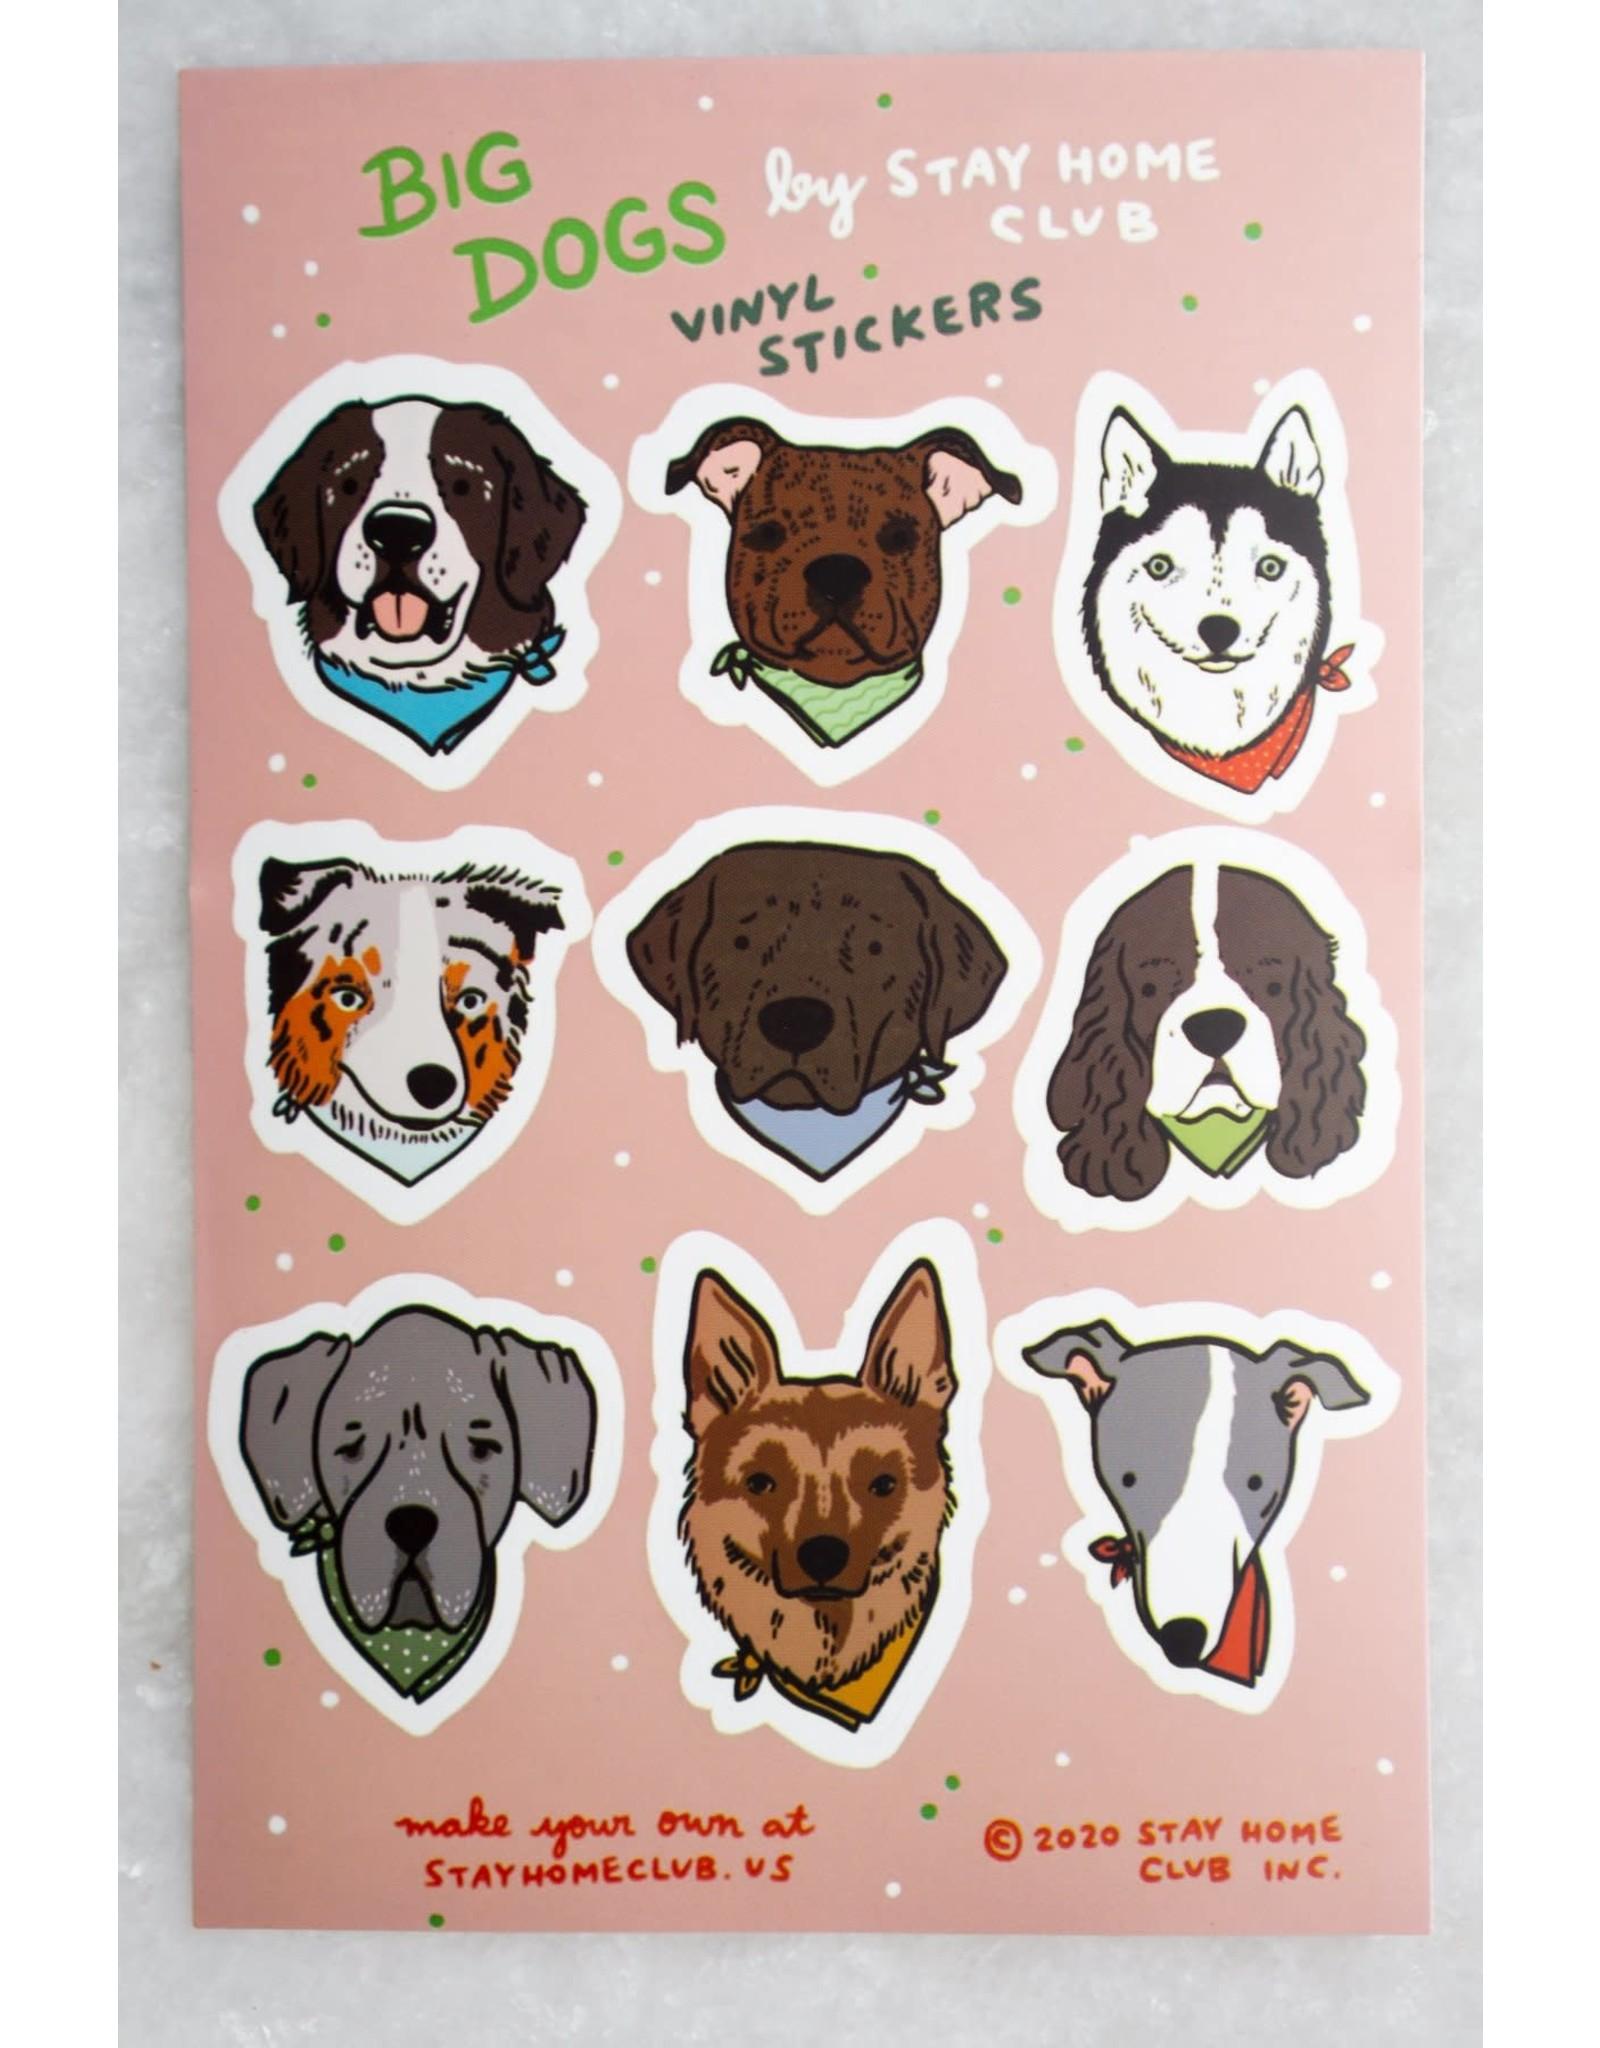 Stay Home Club - Sticker Sheet/Big Dogs